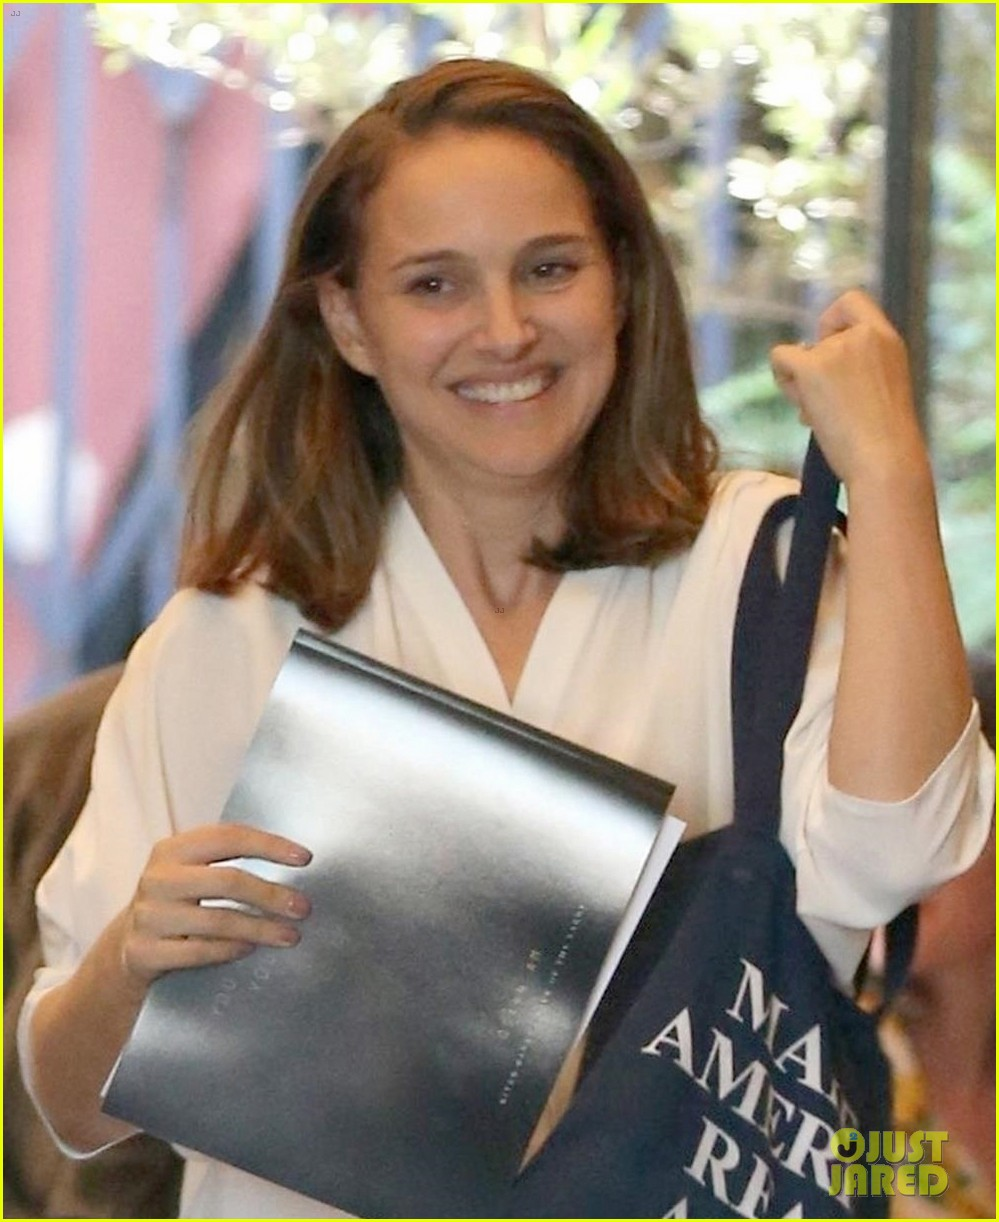 natalie portman goes makeup free while running errands in los feliz 023965083